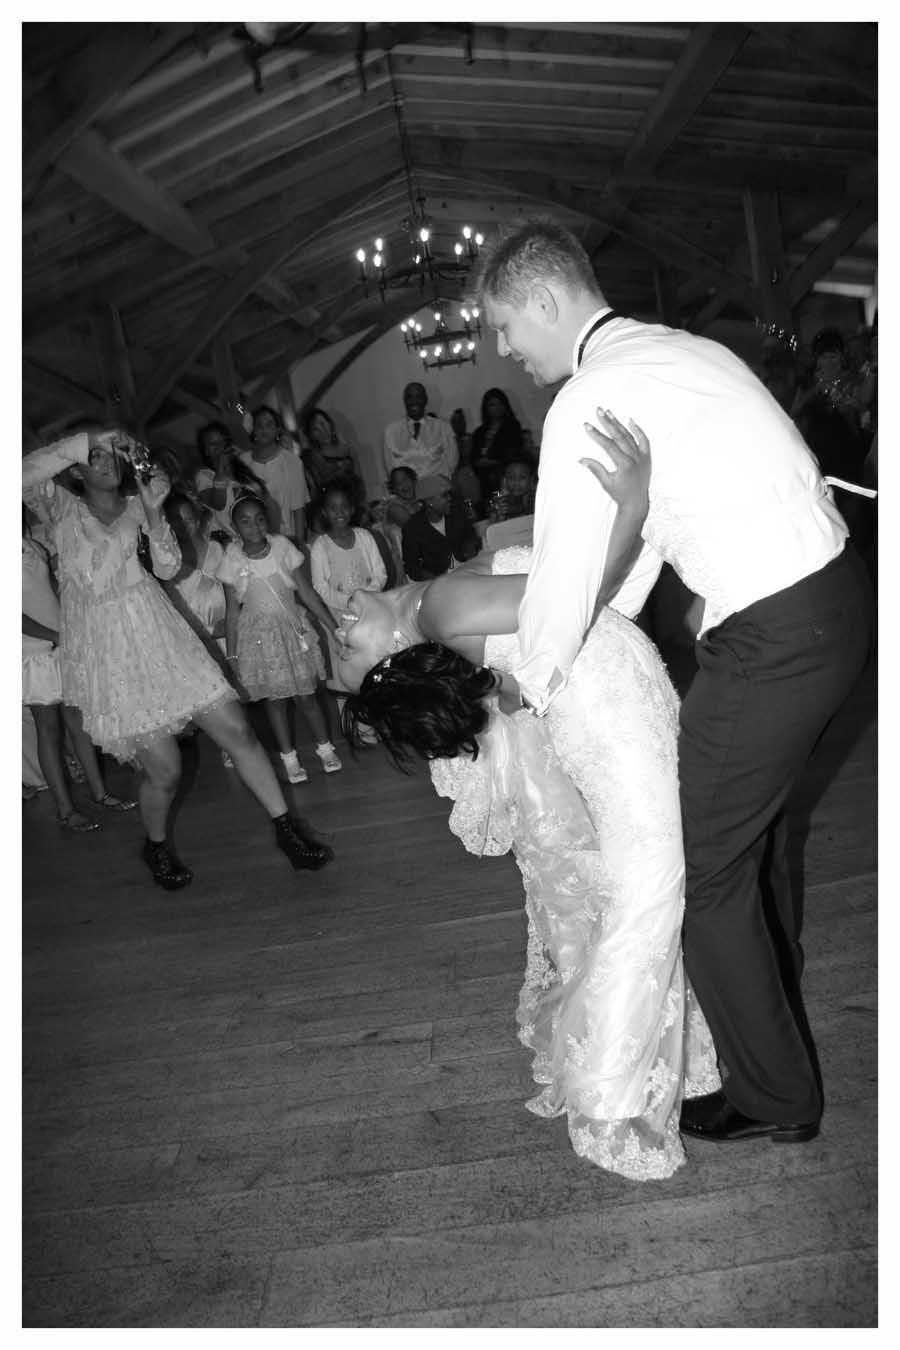 1ST DANCE Photos by  Simeon  Thaw copyright 2014 (18).jpg